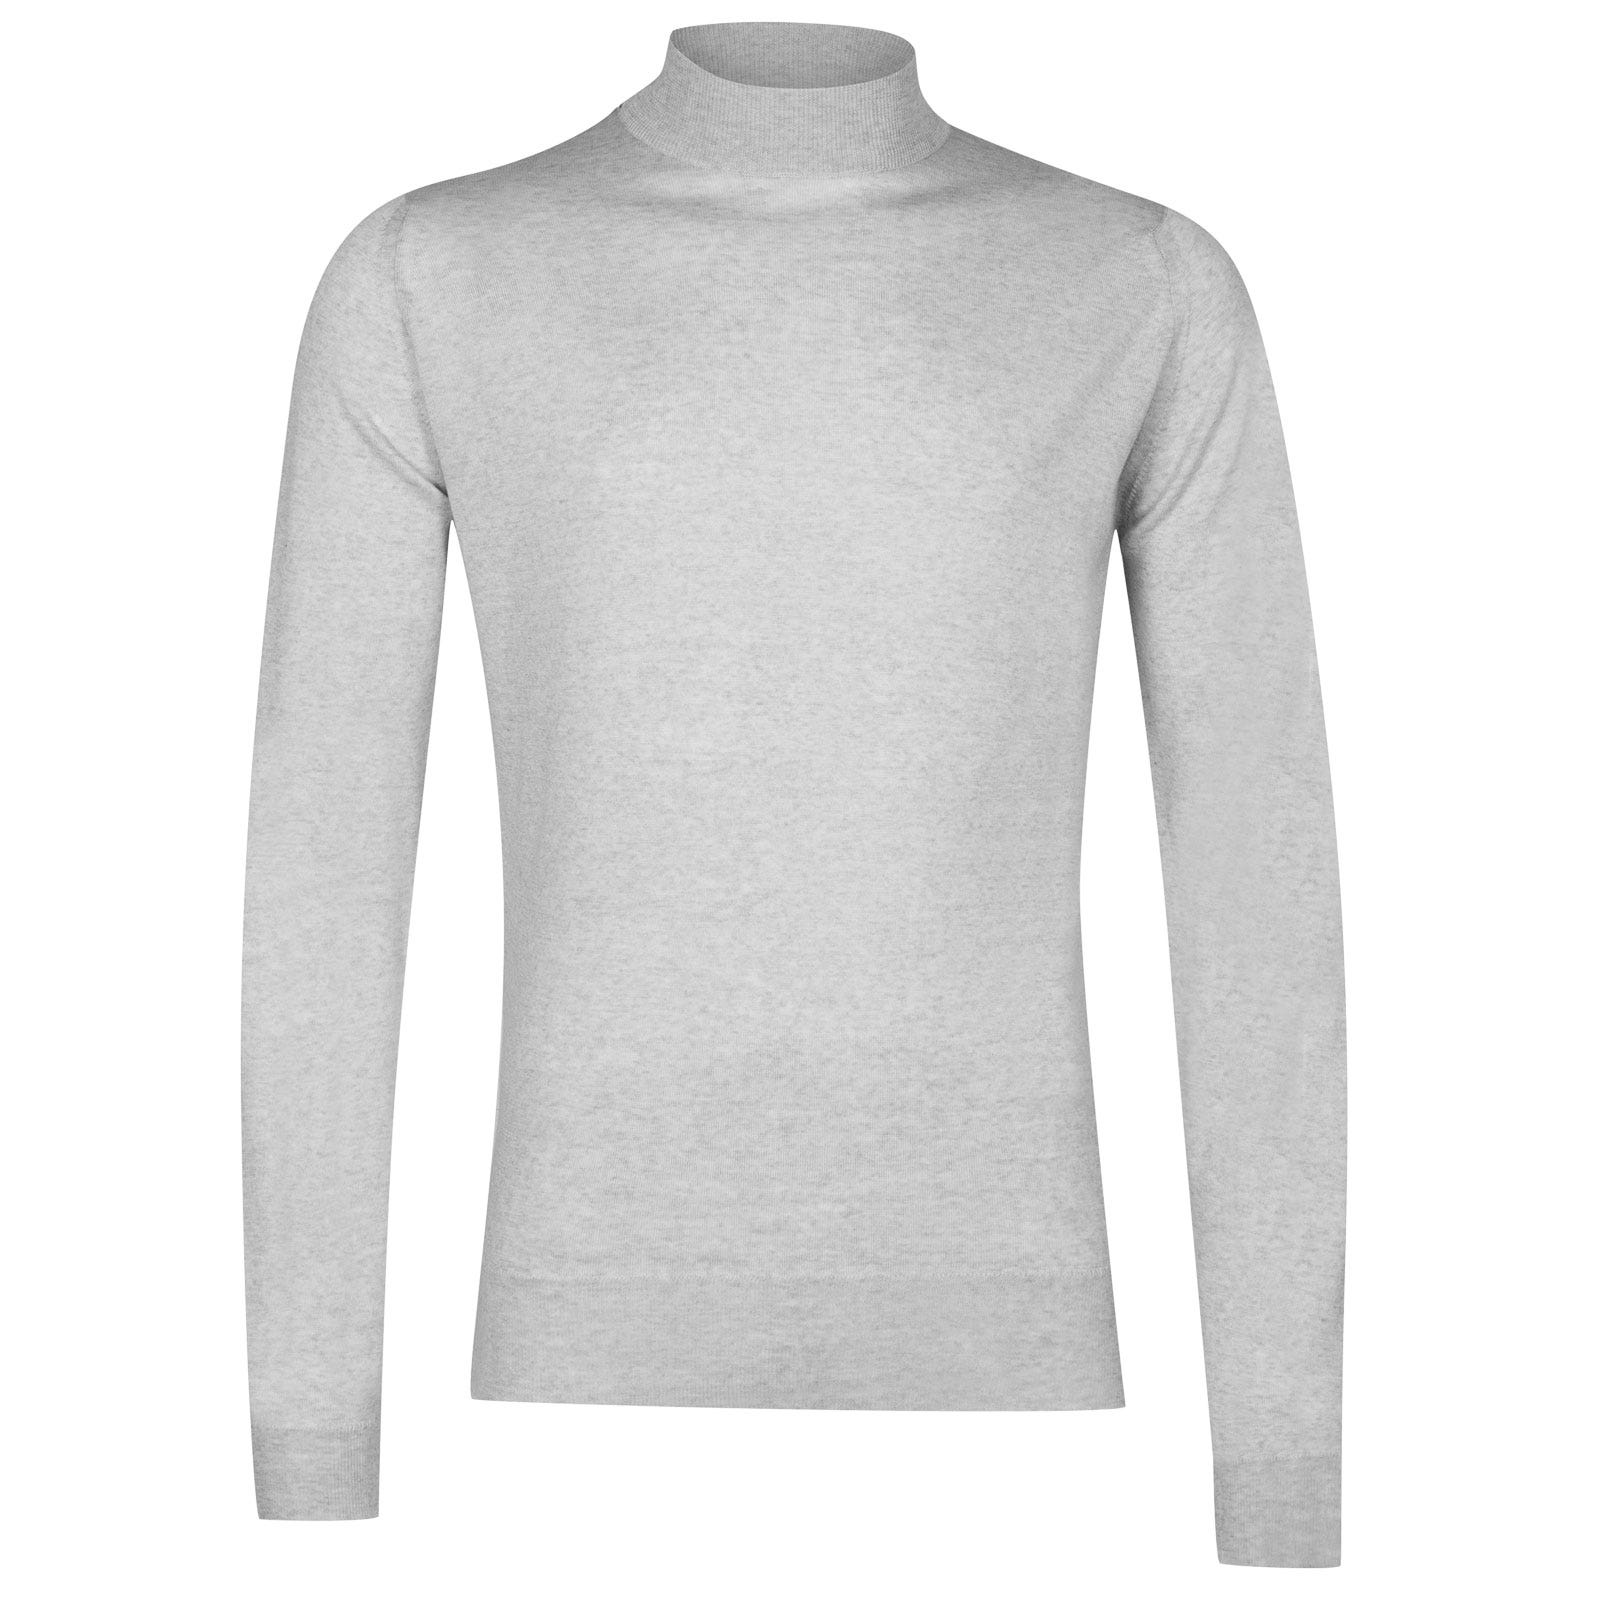 John Smedley harcourt Merino Wool Pullover in Bardot Grey-XL